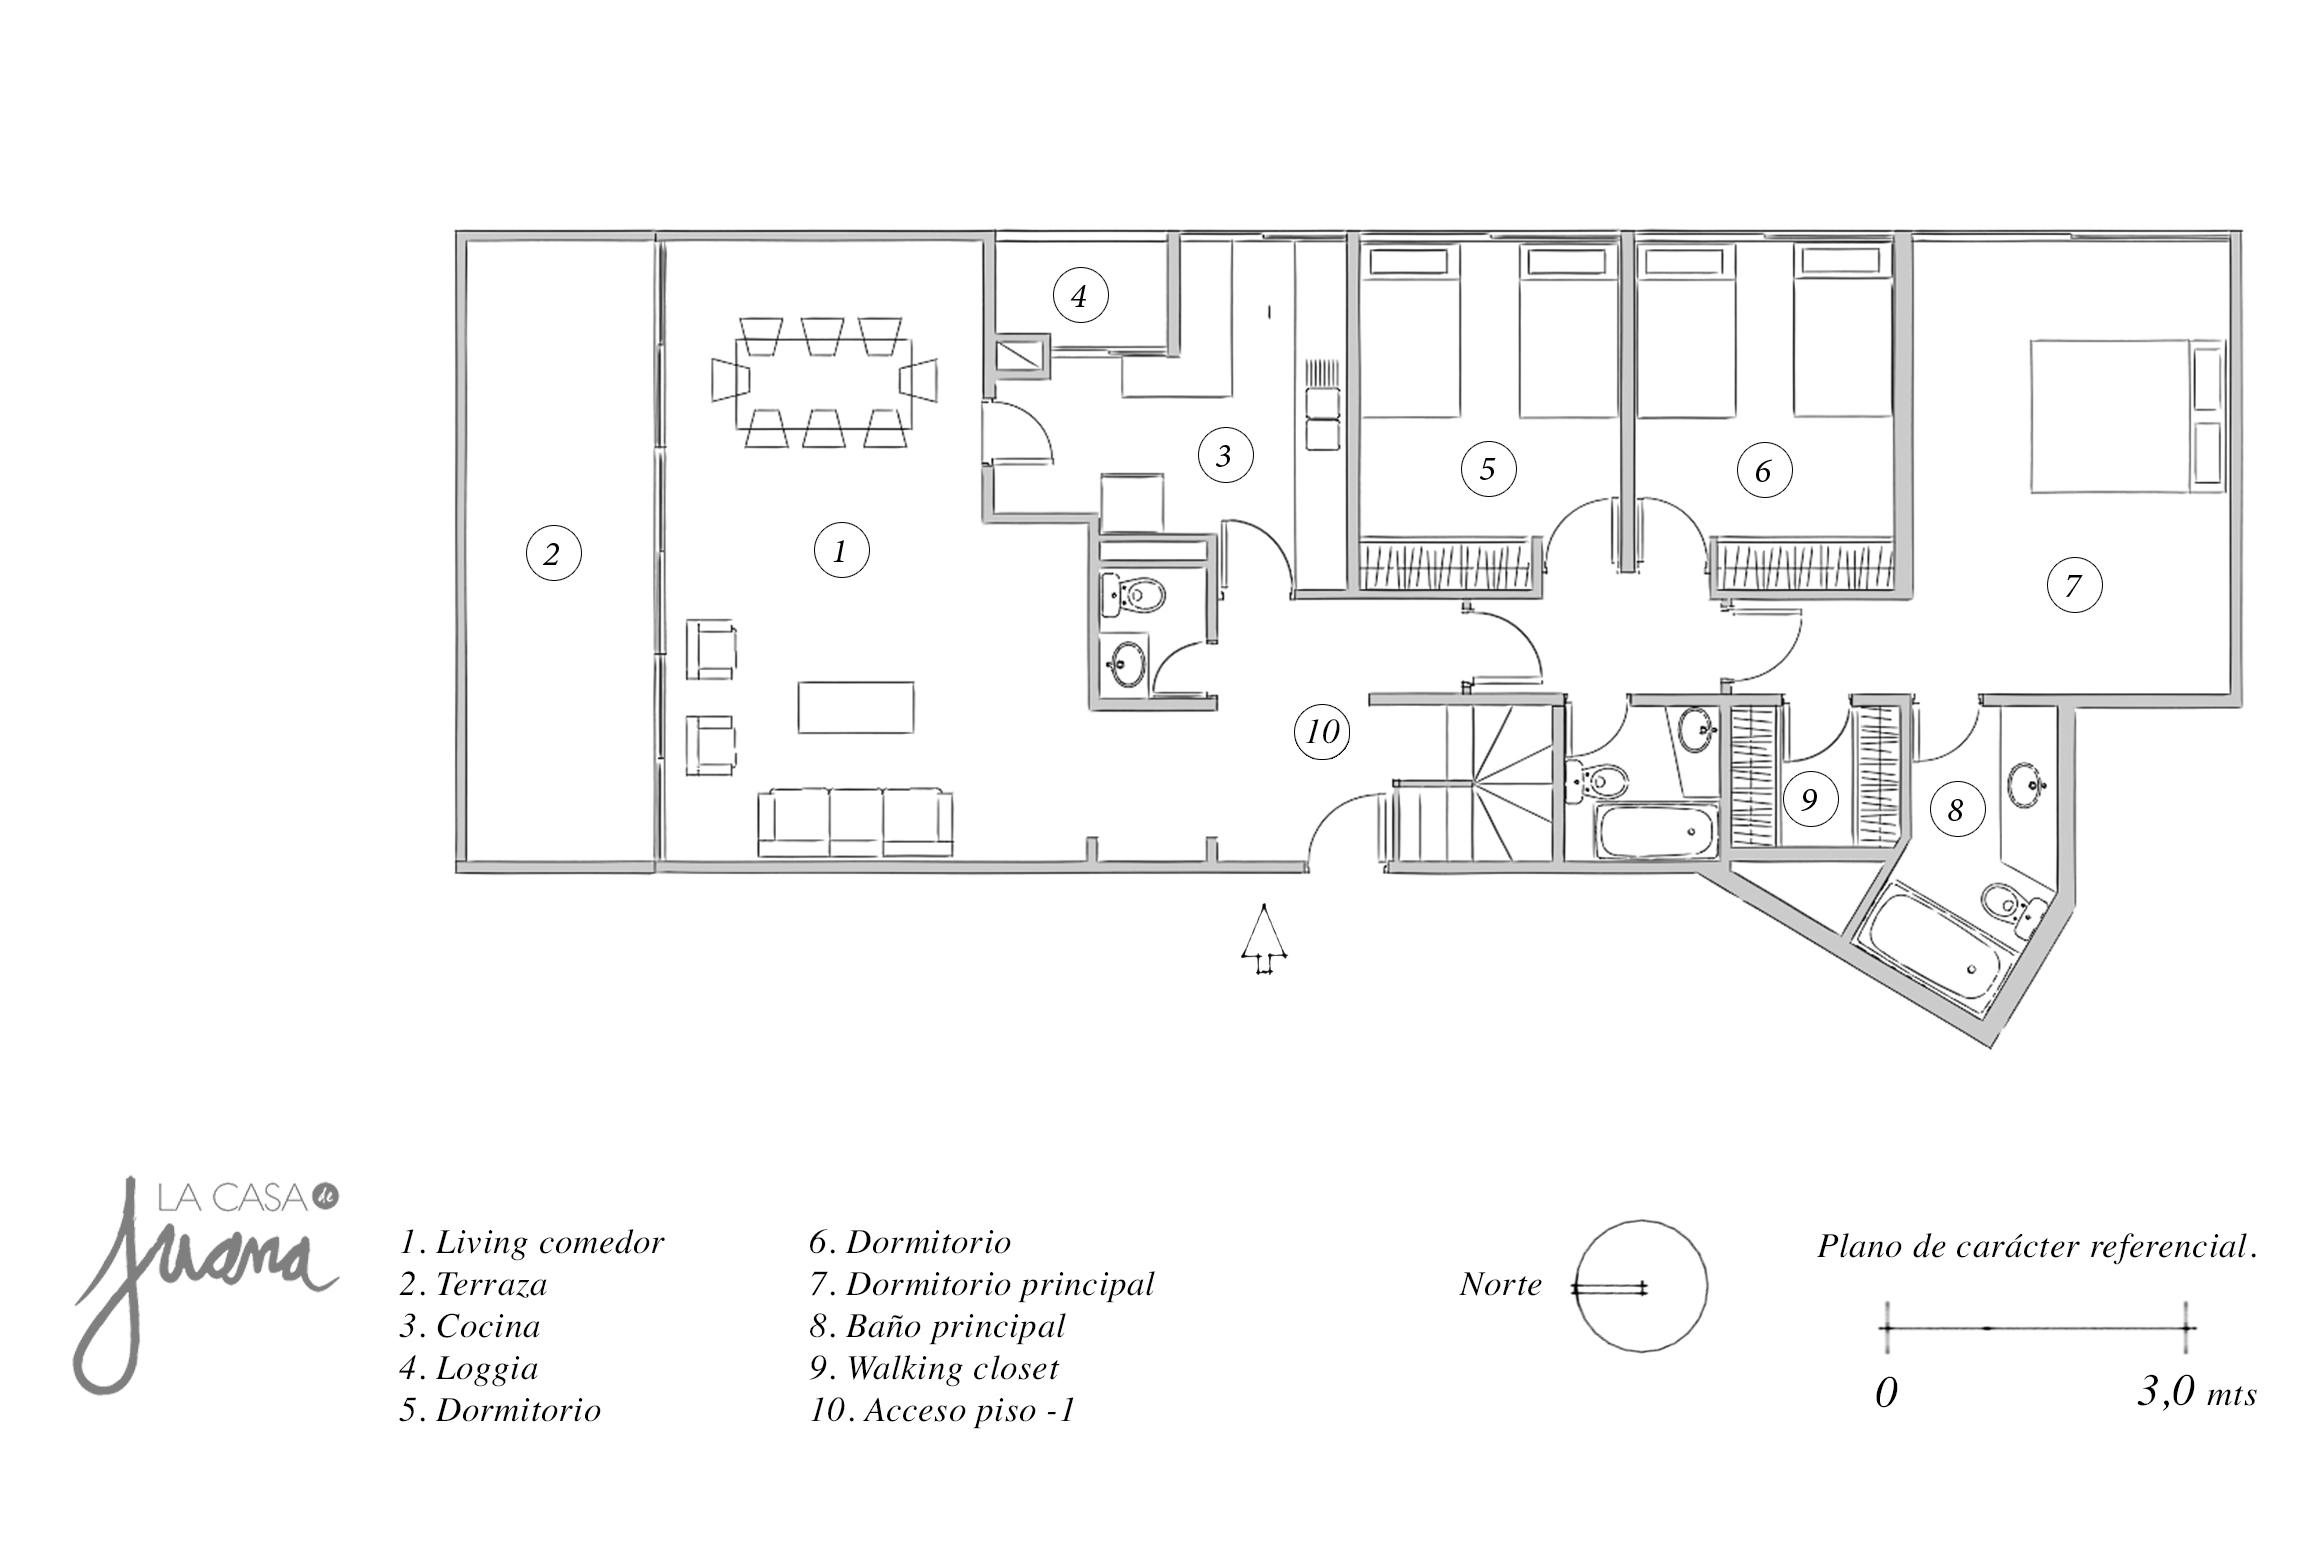 espoz duplex piso 1